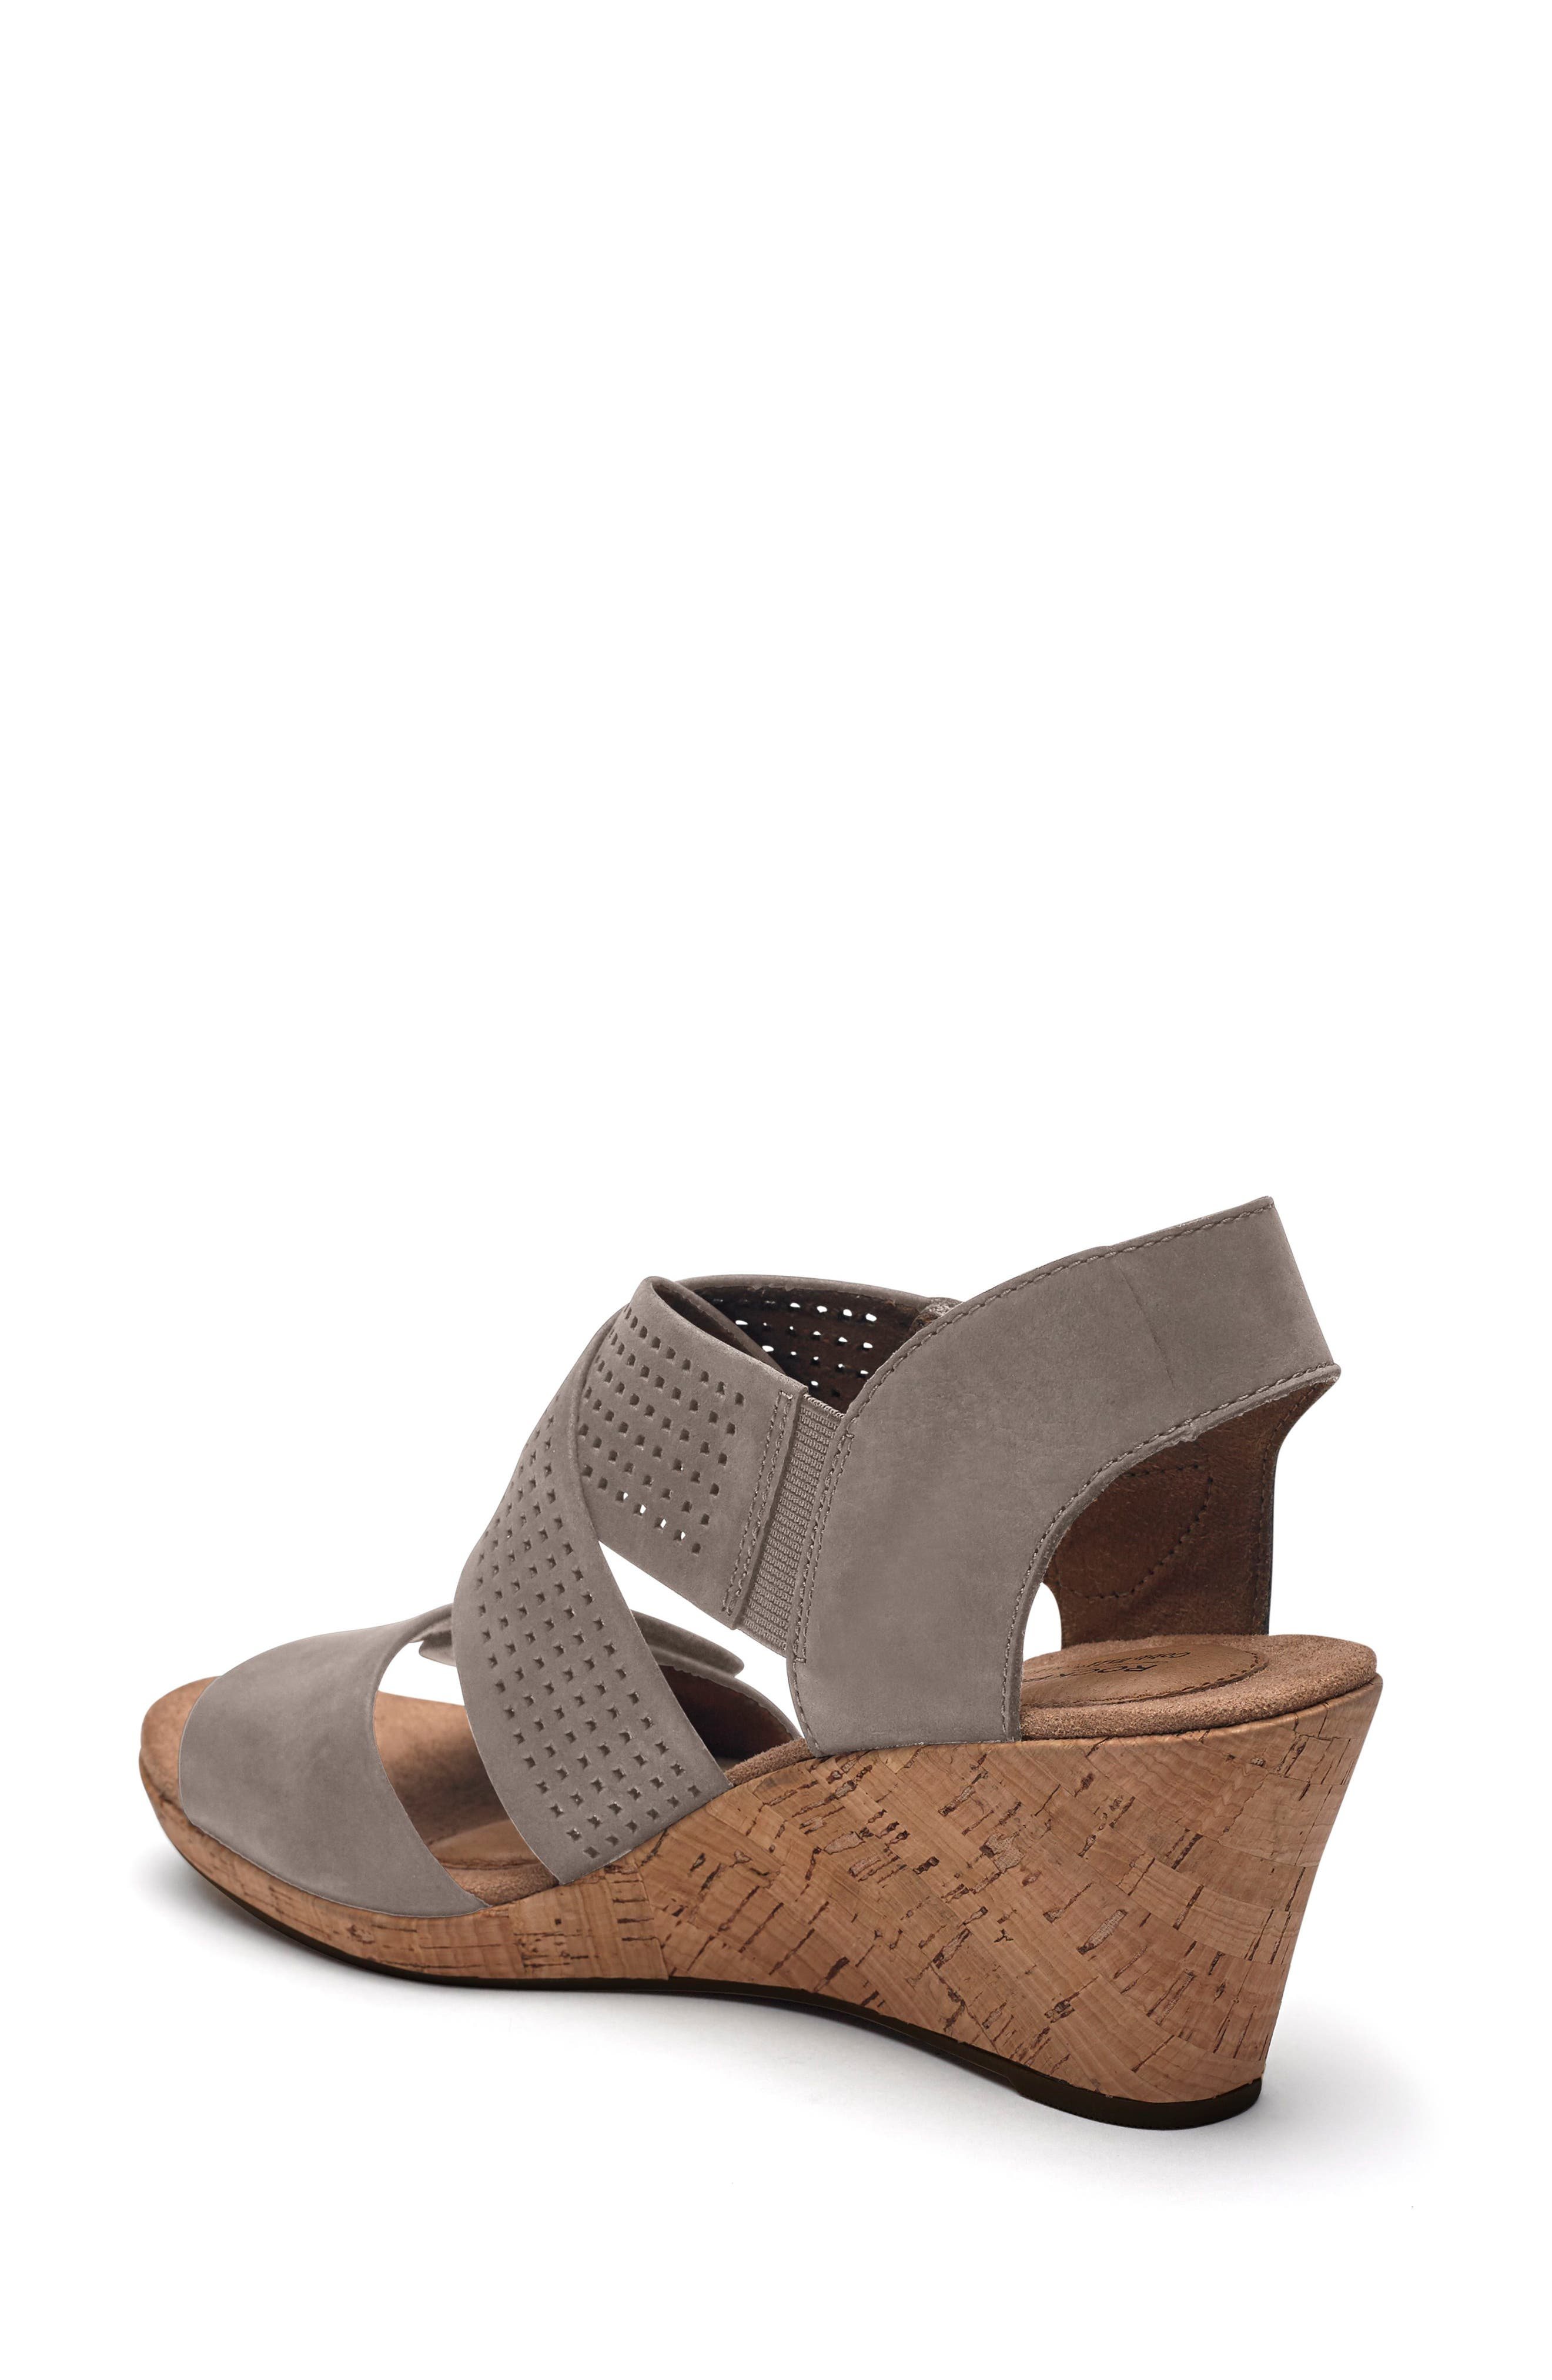 Janna Cross Strap Wedge Sandal,                             Alternate thumbnail 8, color,